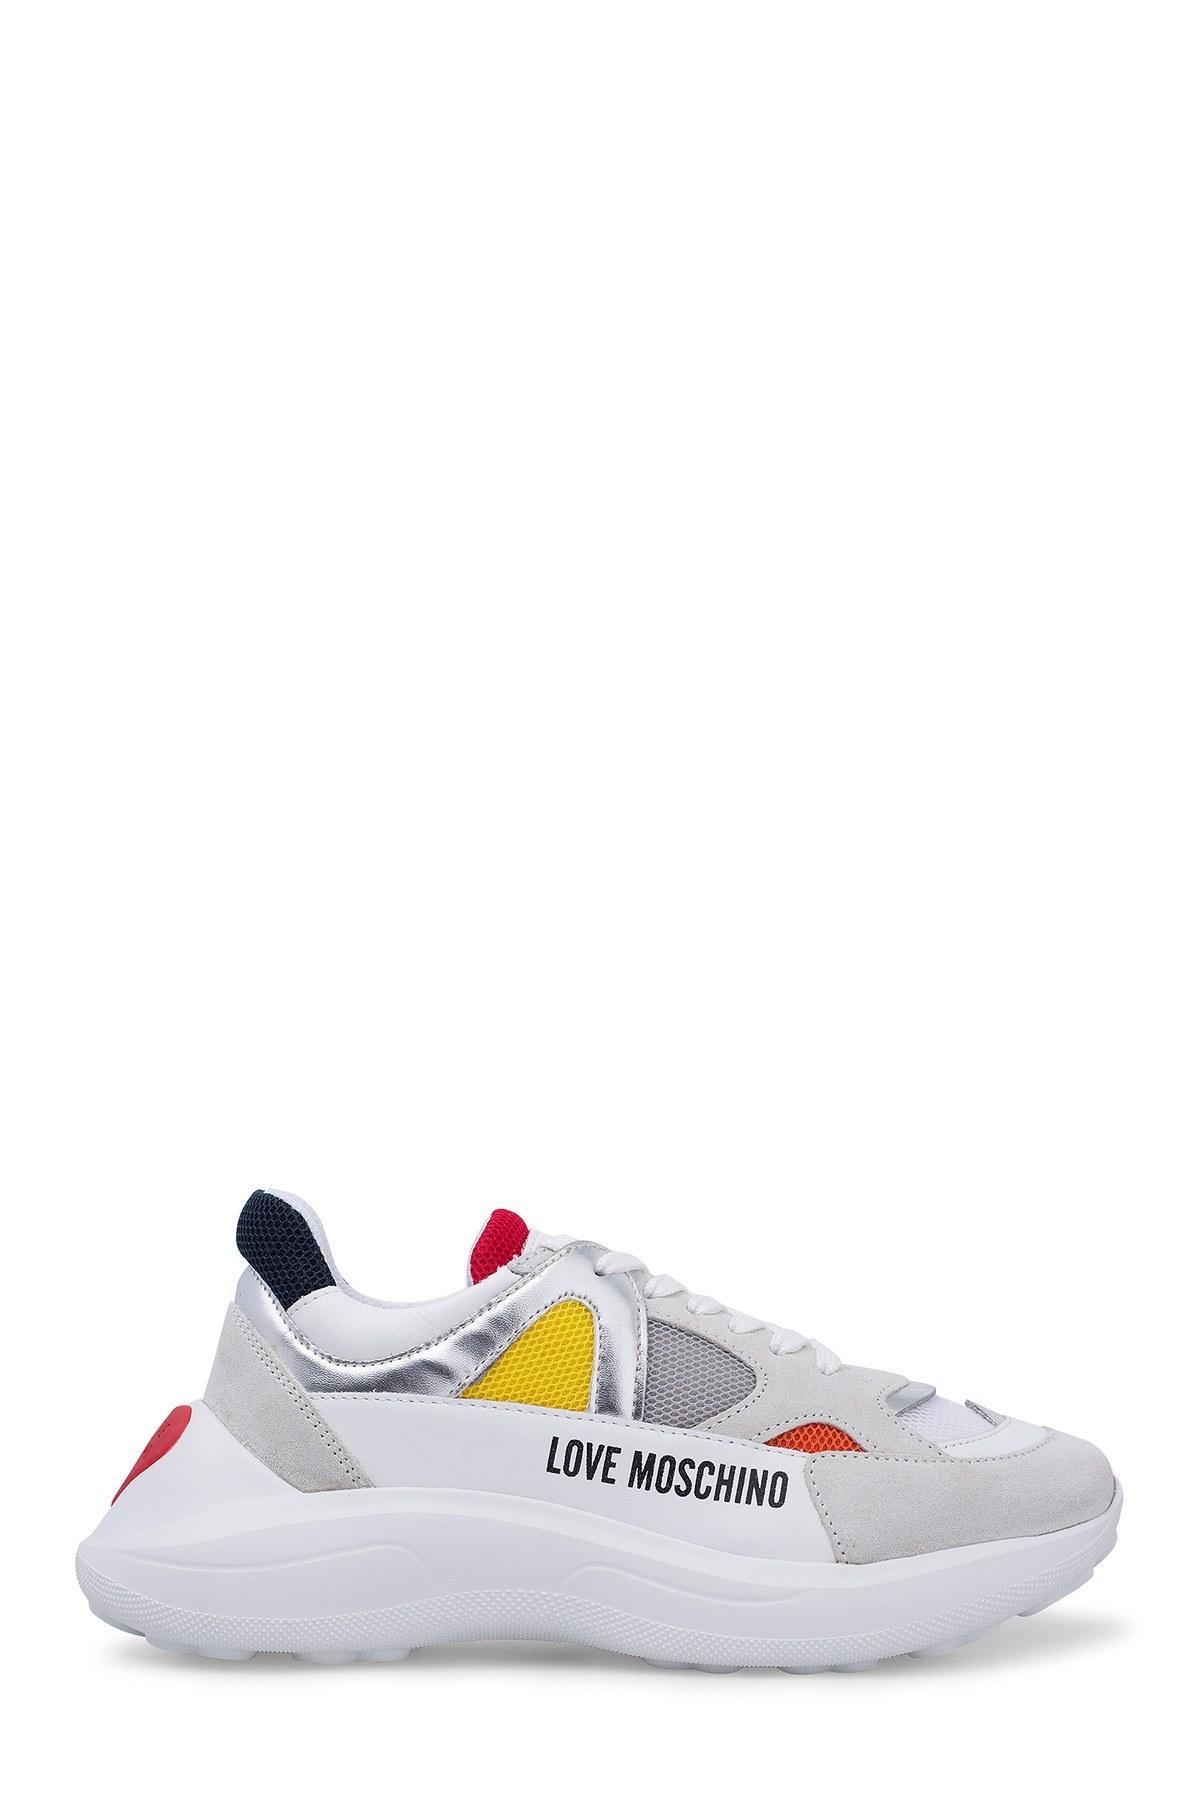 Love Moschino Kadın Ayakkabı JA15306G1A01A BEYAZ